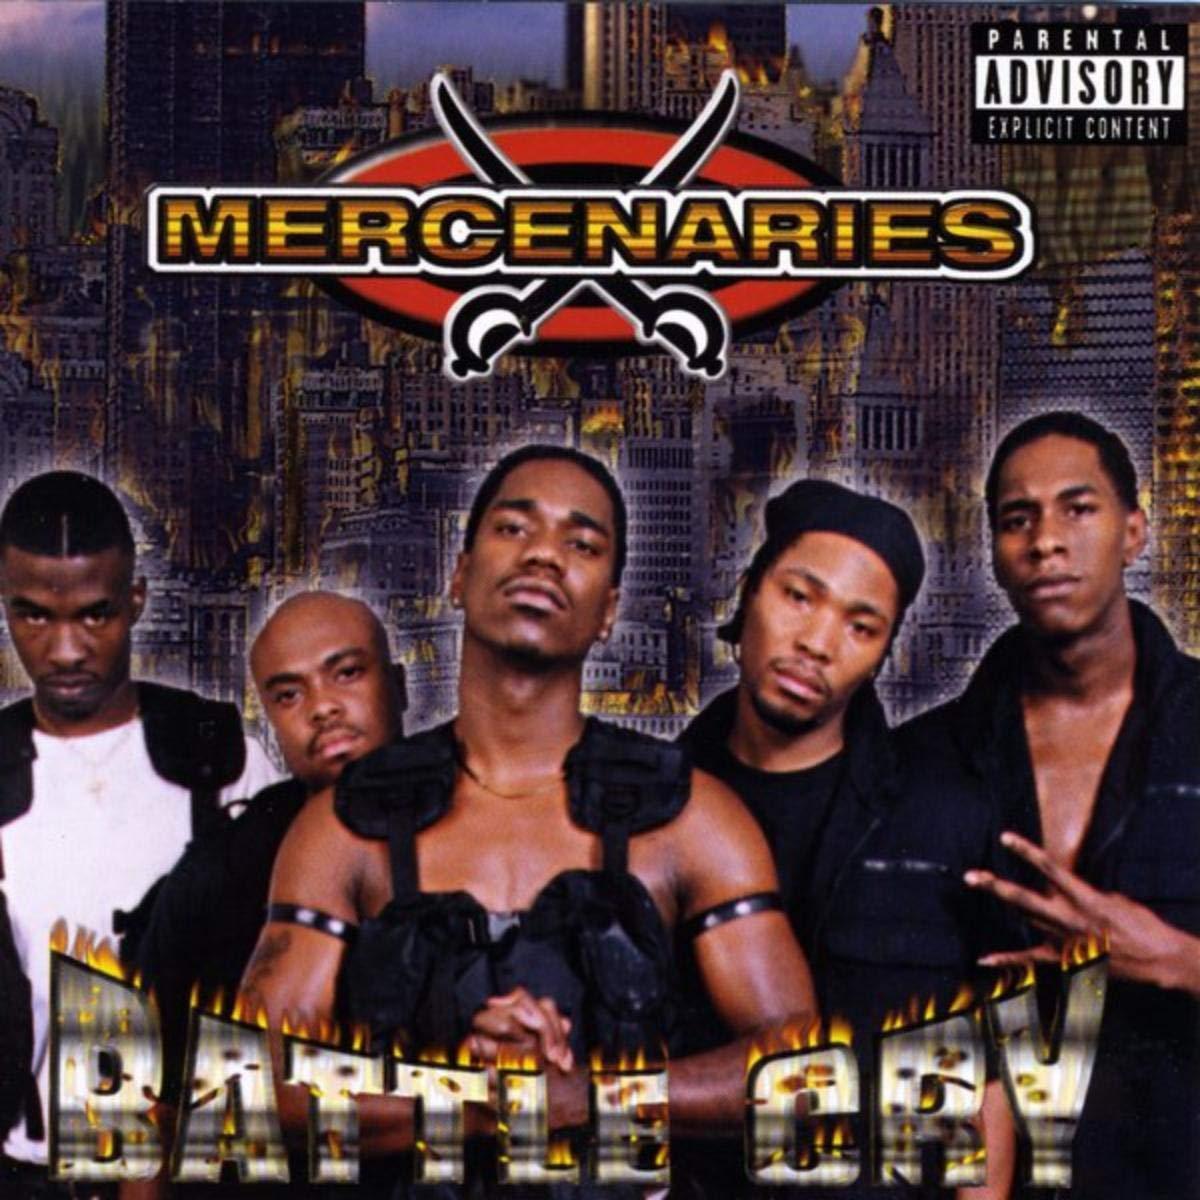 Mercenaries - Battle Cry (1998) [FLAC] Download